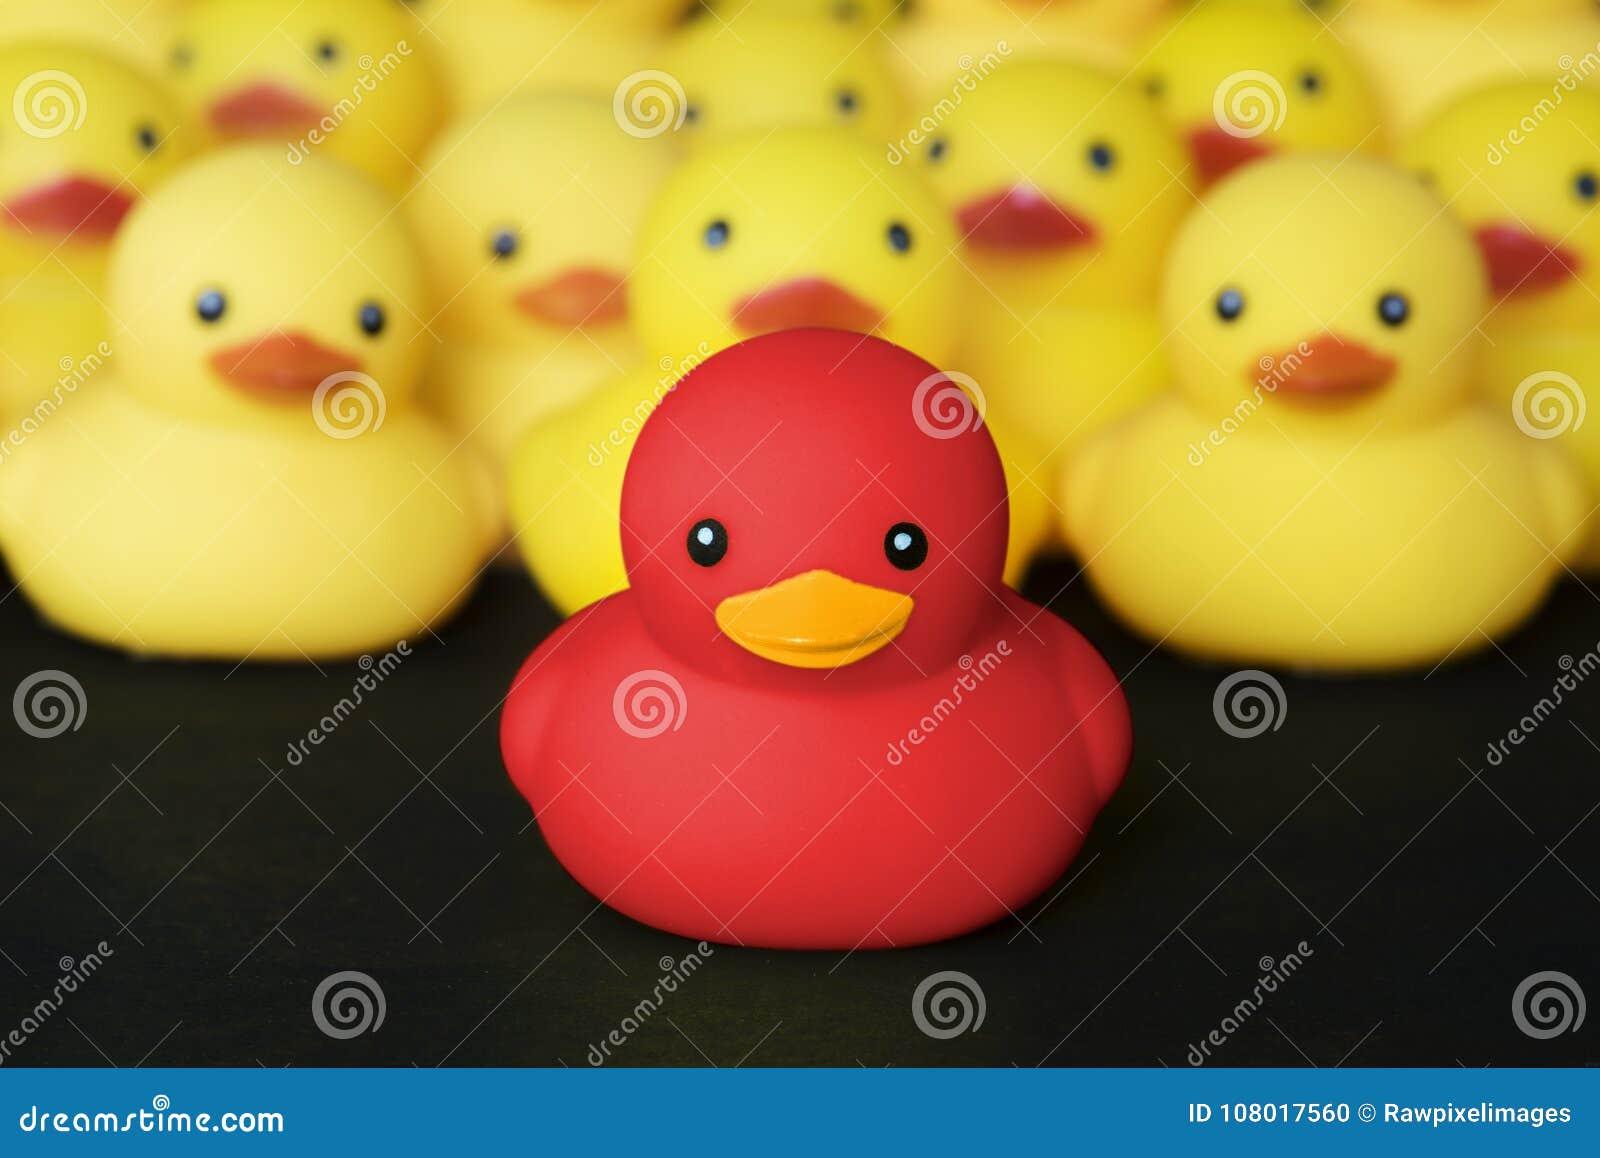 Close-up van rubber duckies met leiding